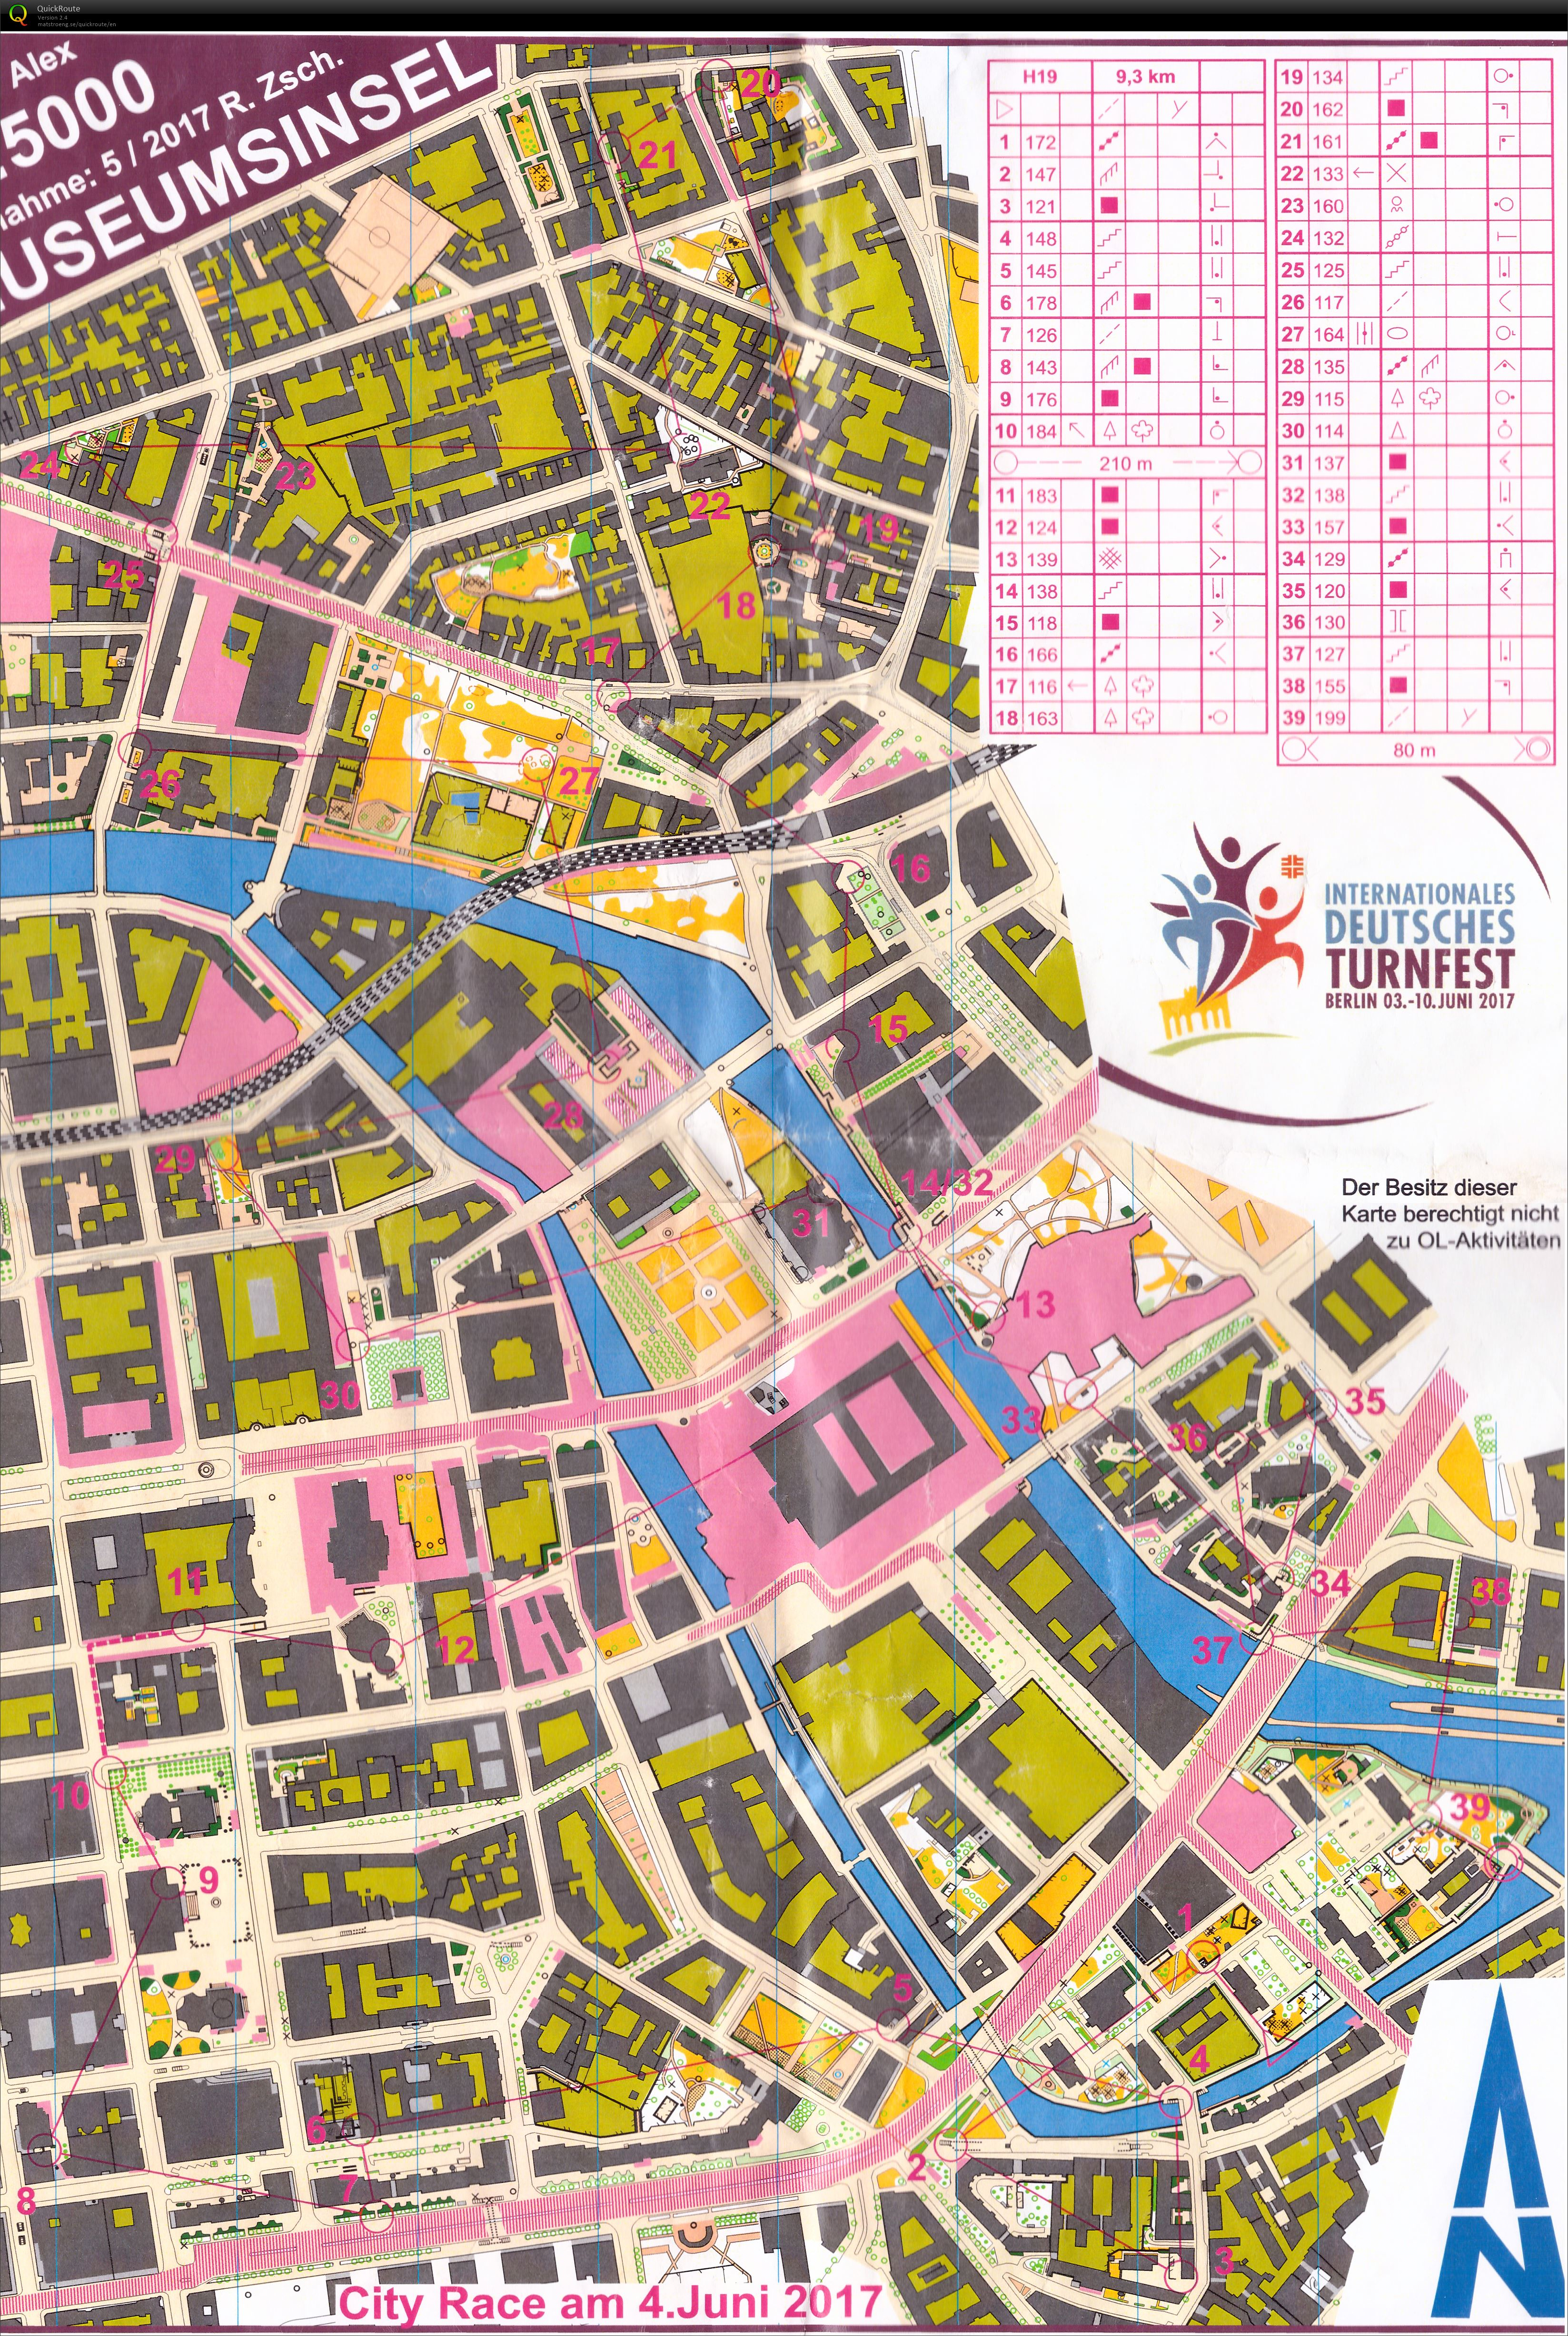 Days Berlin Cityrace June Th Orienteering Map From - Berlin map 2017